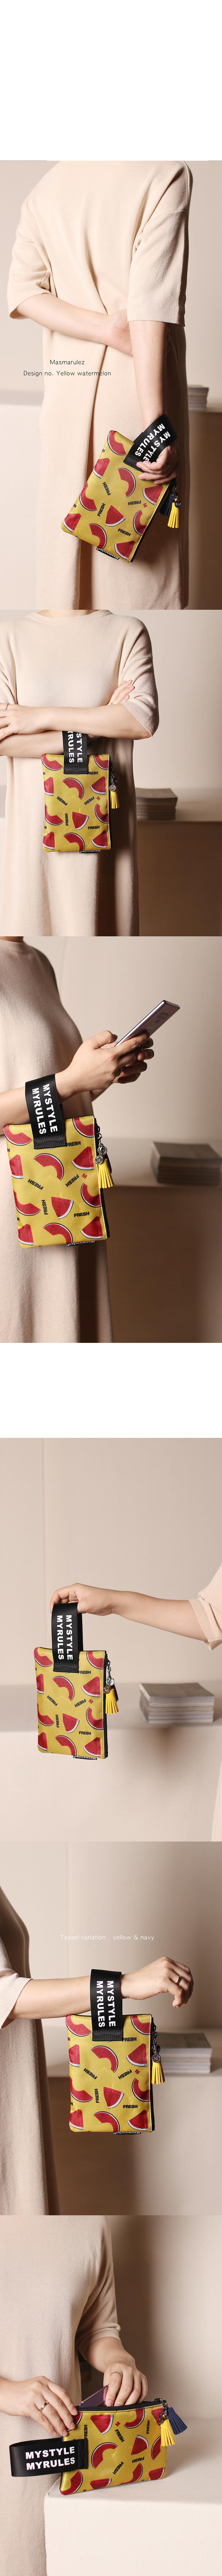 yellow-watermelon-m900-m.jpg